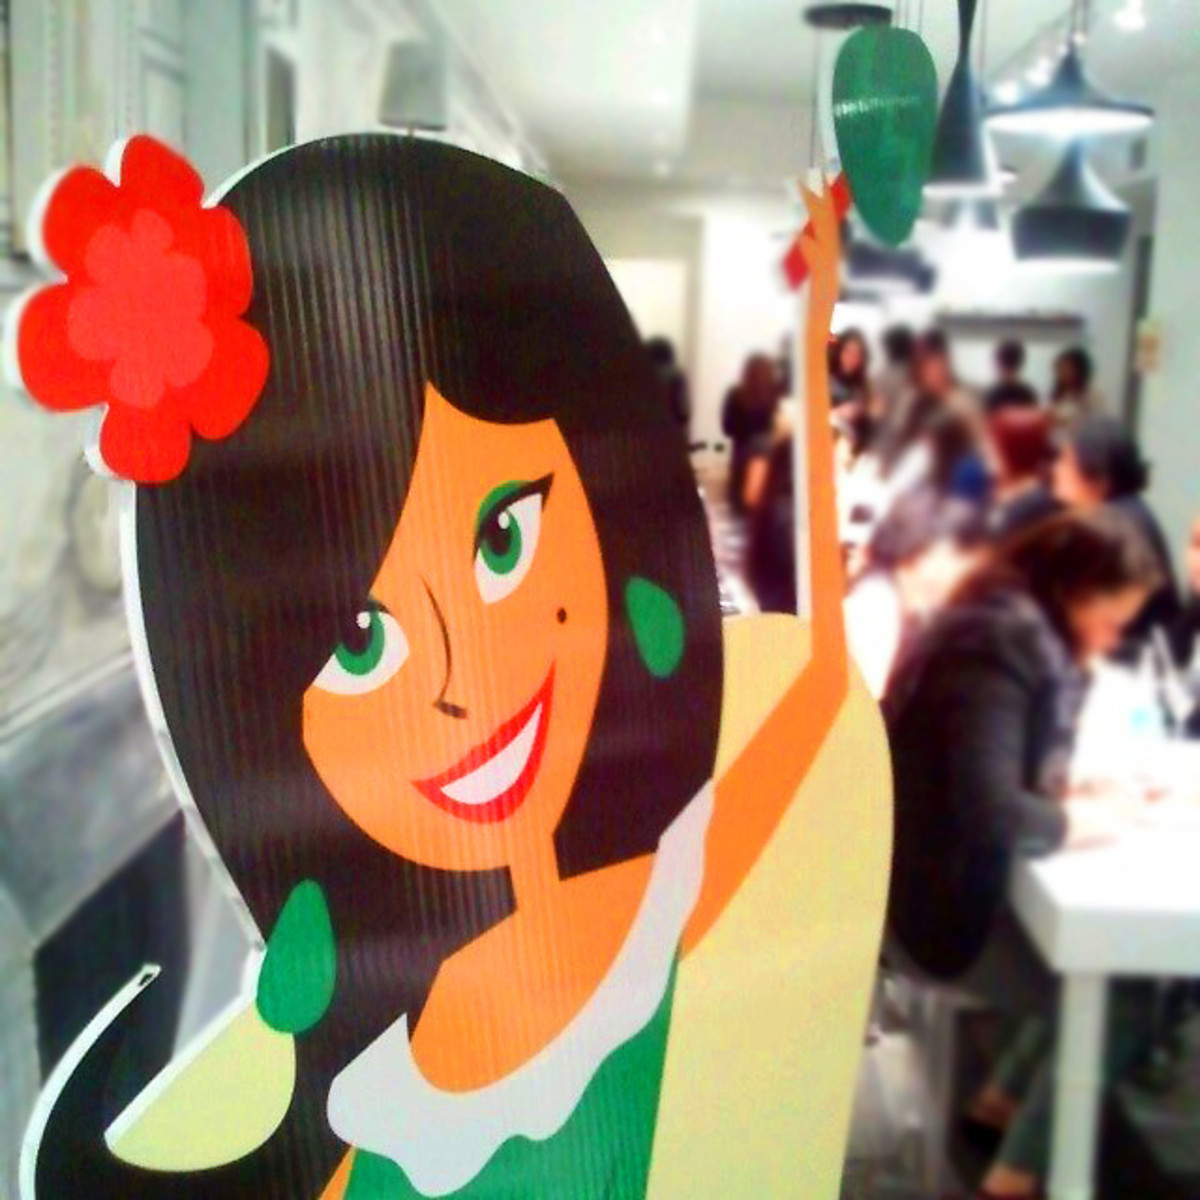 avocado beauty treatments_Avocados from Mexico_MissAvaCado_LuvMexAvocado_TipsNailBar